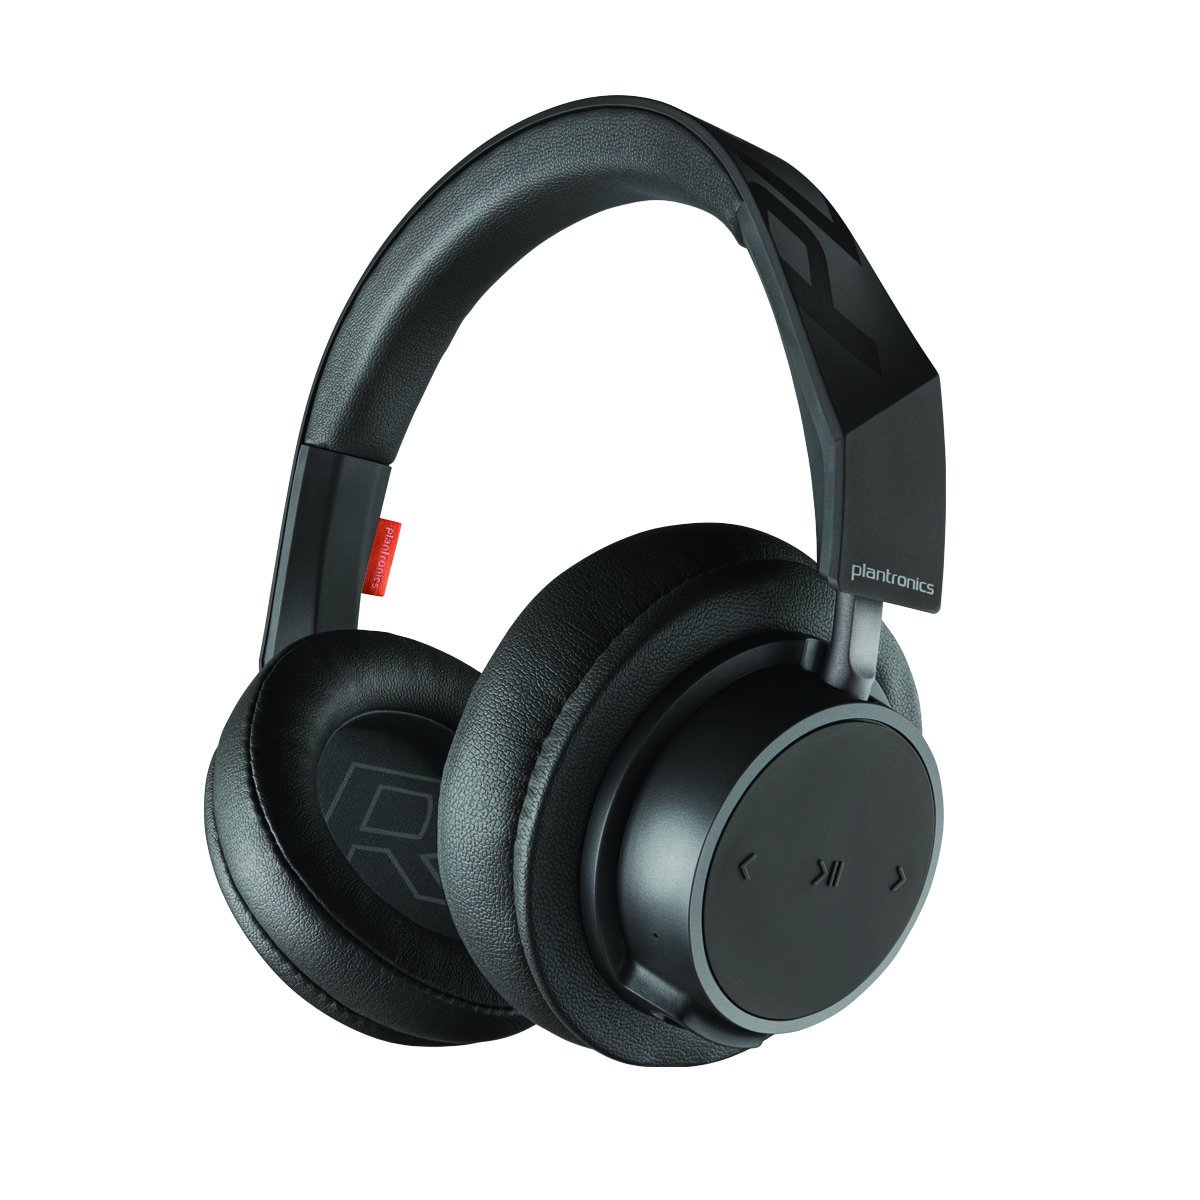 Plantronics BackBeat GO 600 Noise-Isolating Headphones, Over-The-Ear Bluetooth Headphones, Black